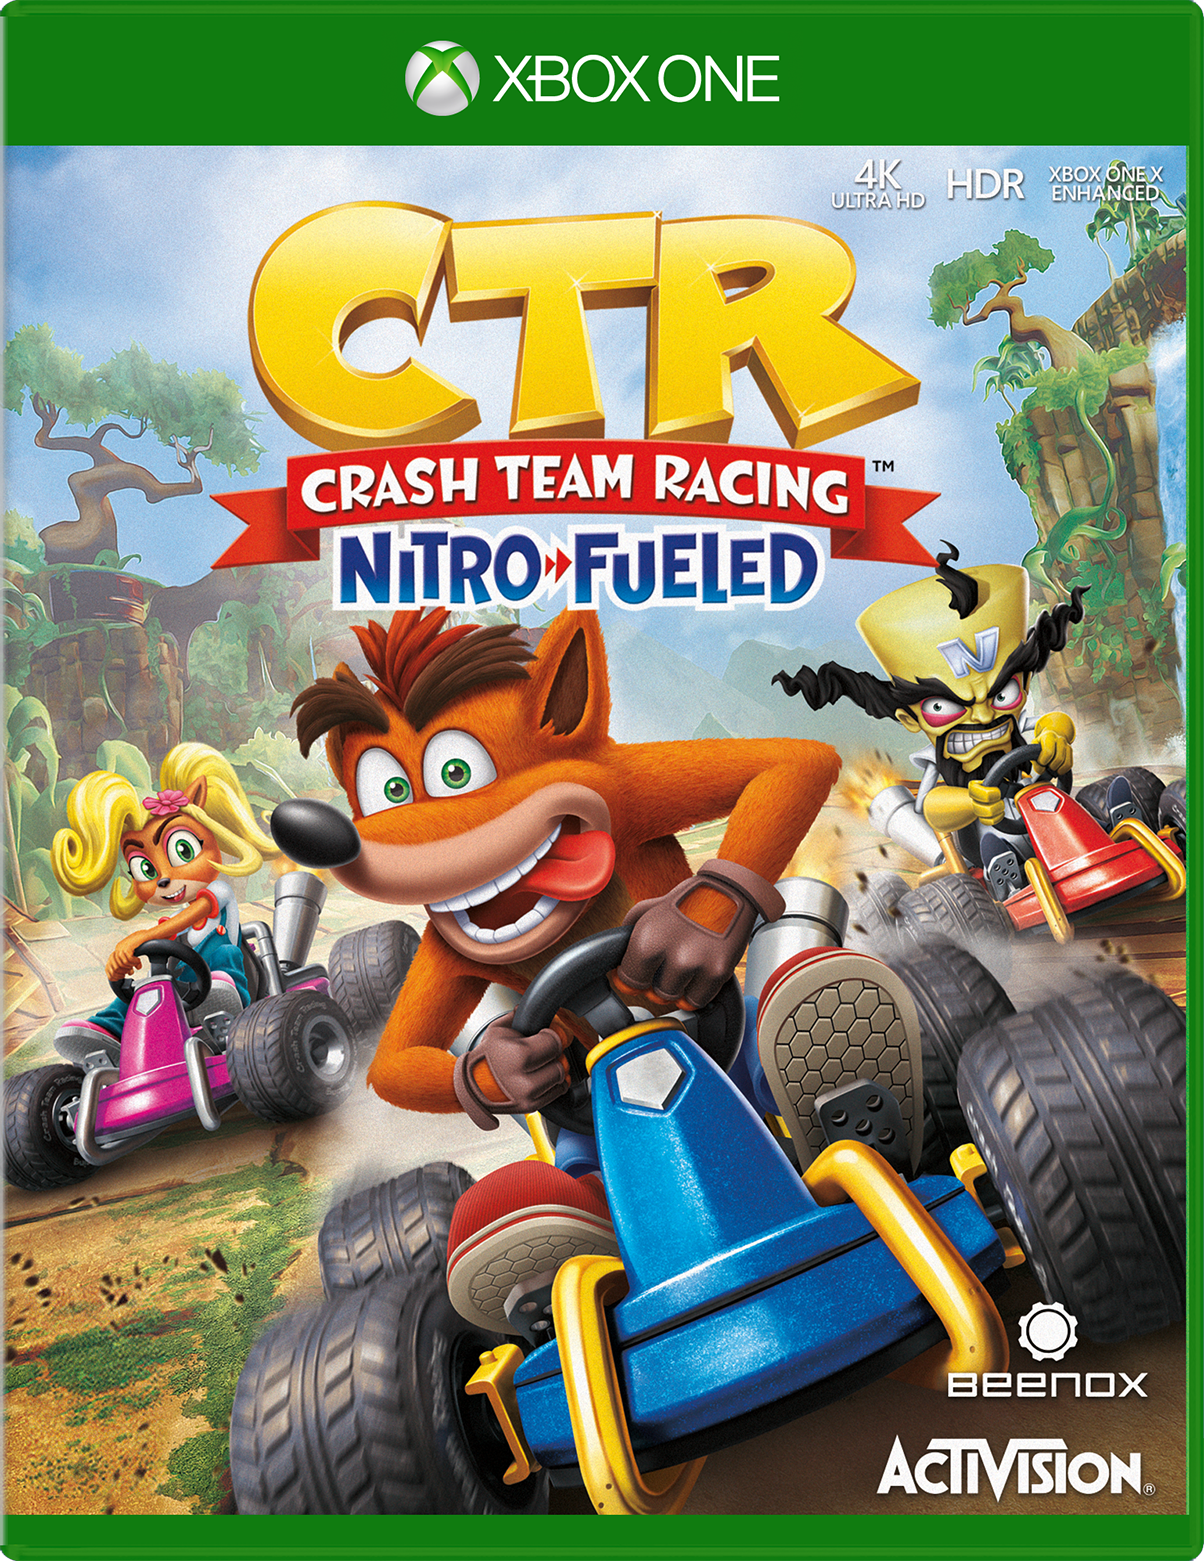 Crash Team Racing: Nitro Fueled for Xbox One game box